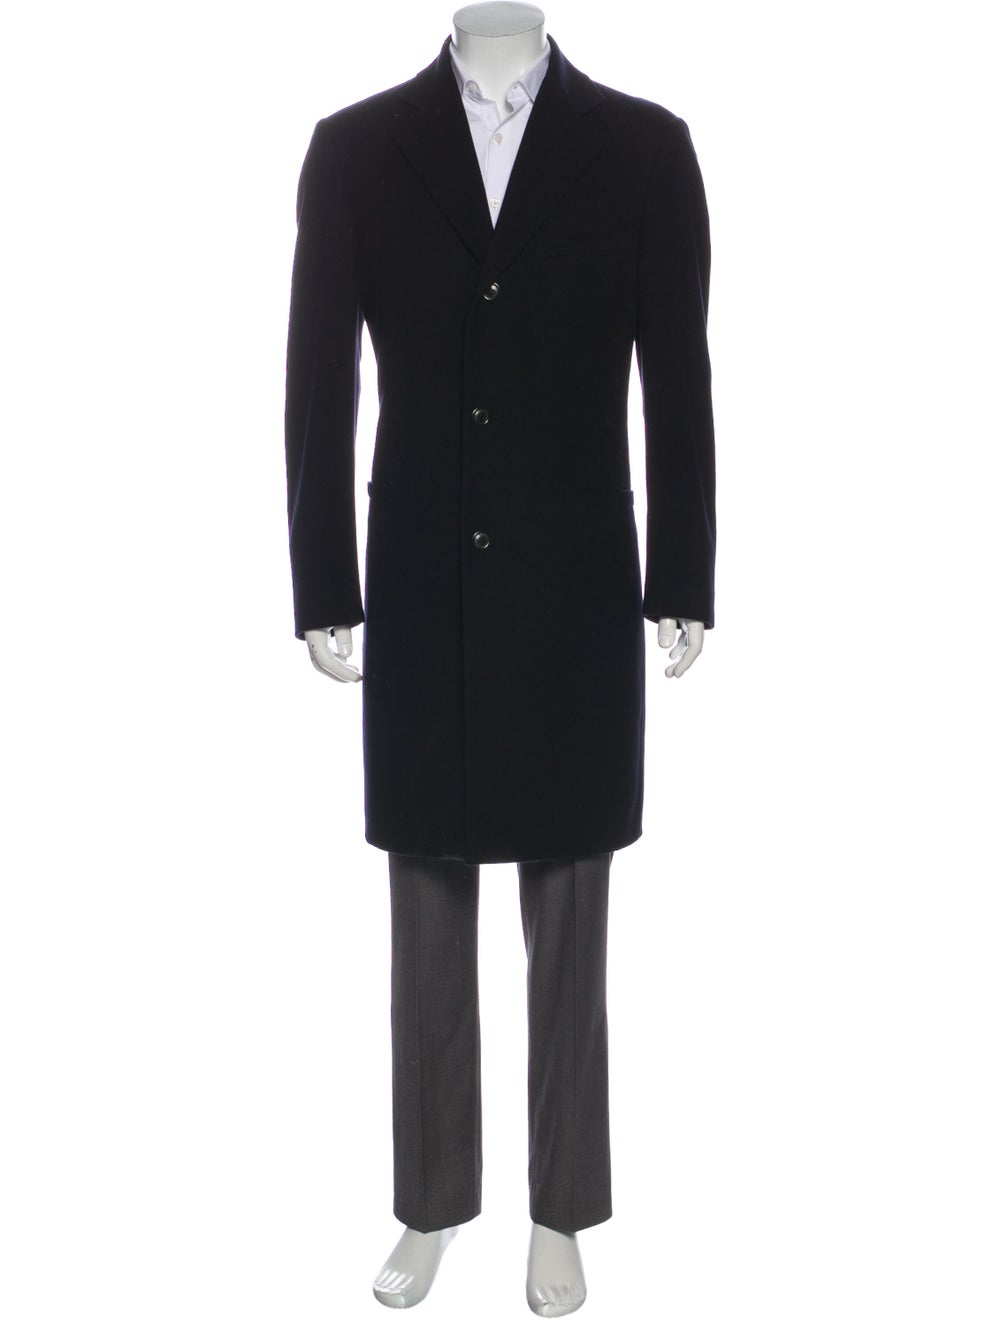 Manrico Cashmere Cashmere Overcoat Black - image 1